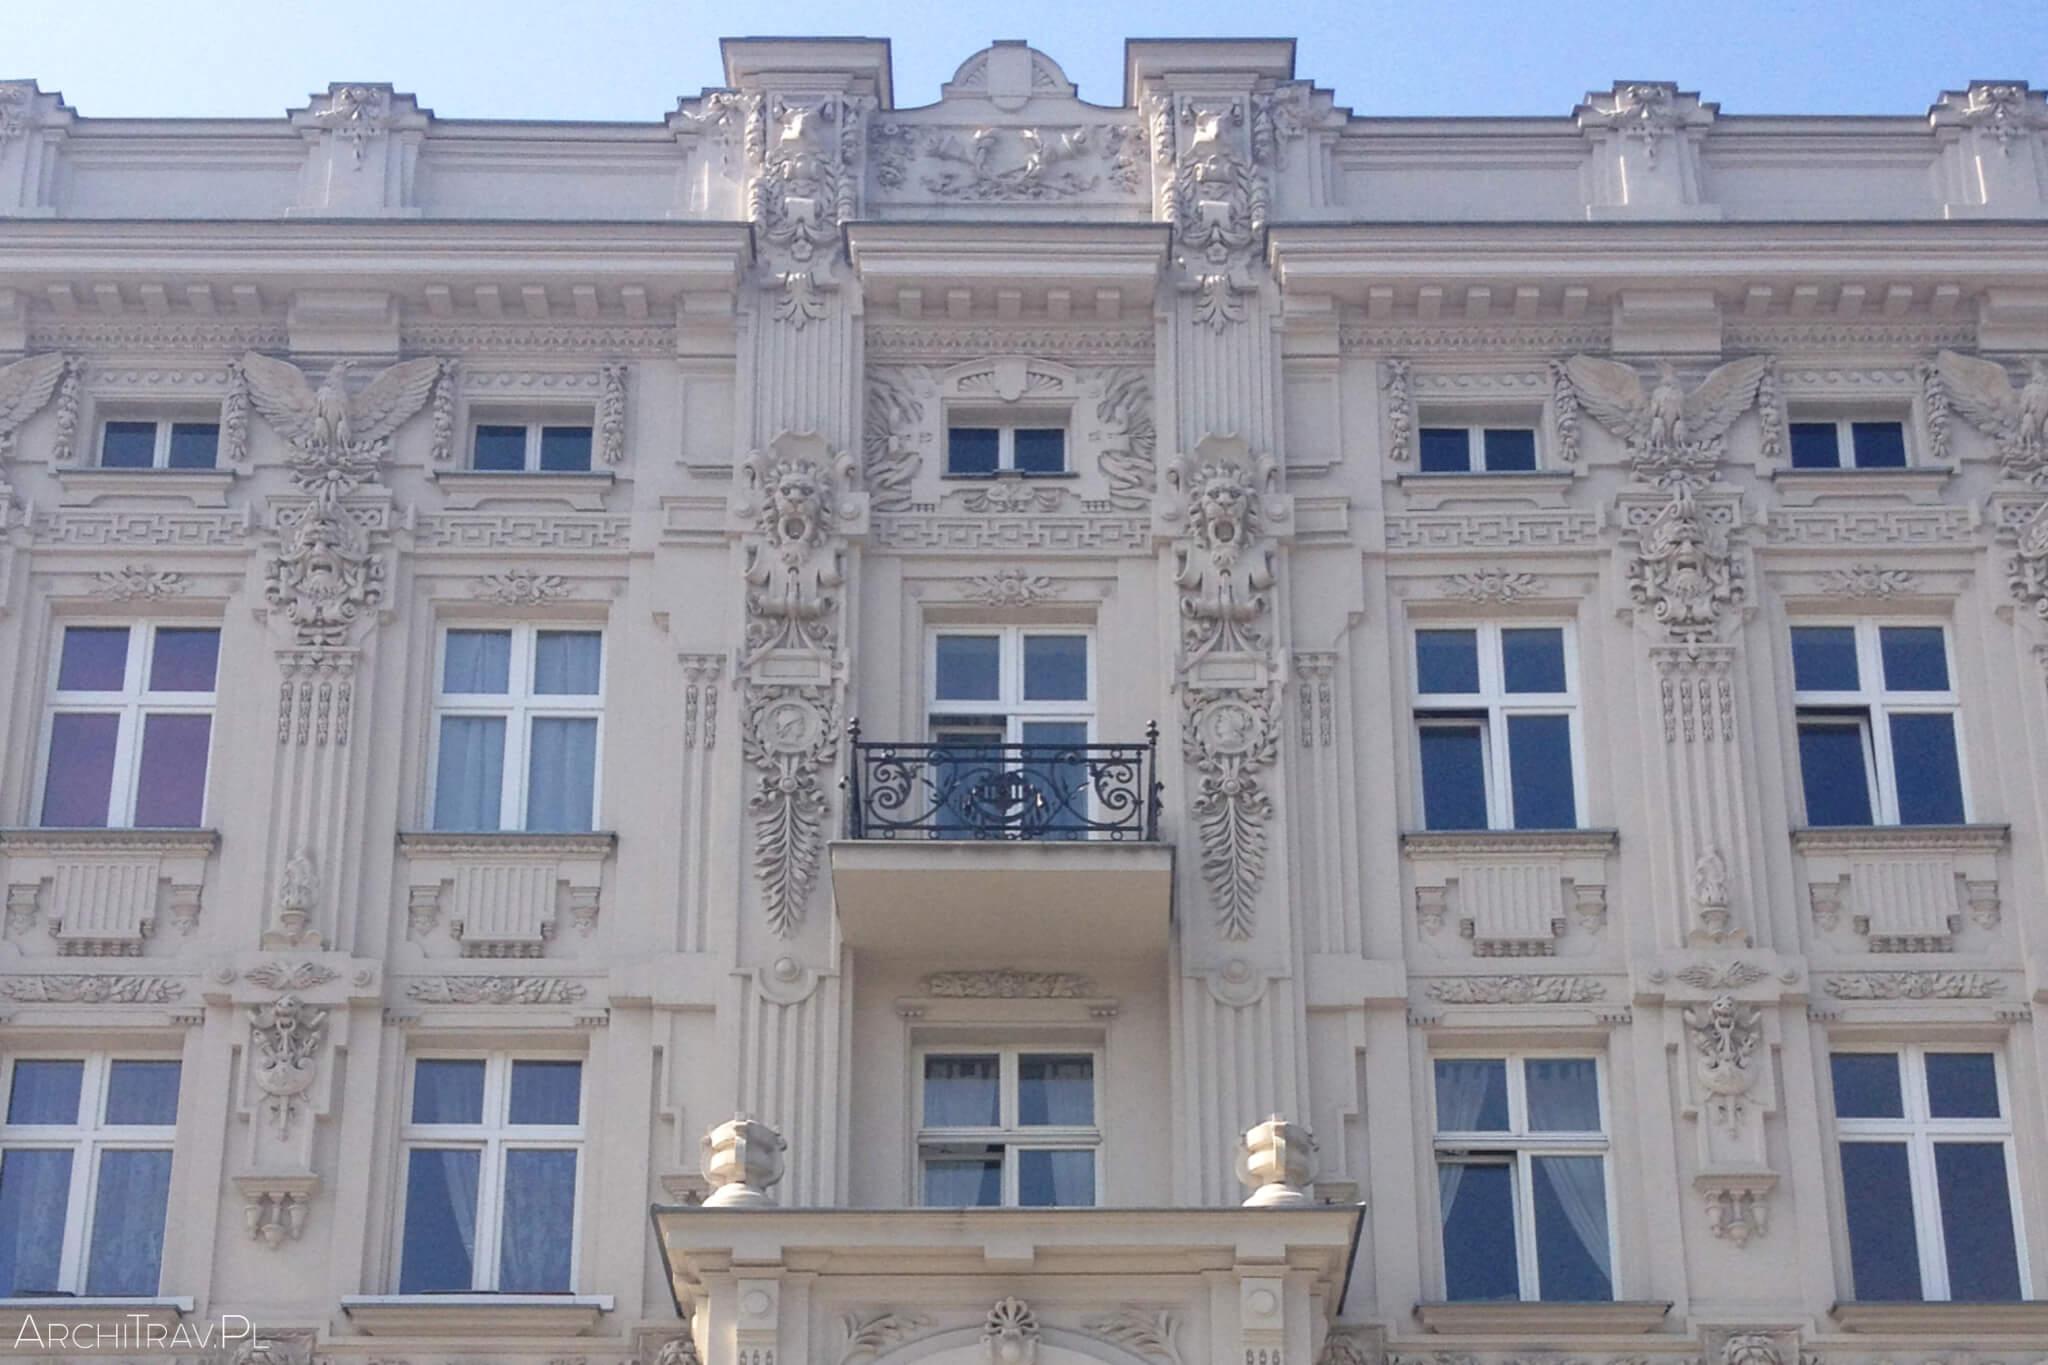 Kamienica Salomona Bahariera, Piotrkowska 107 Edward Kreuzburg